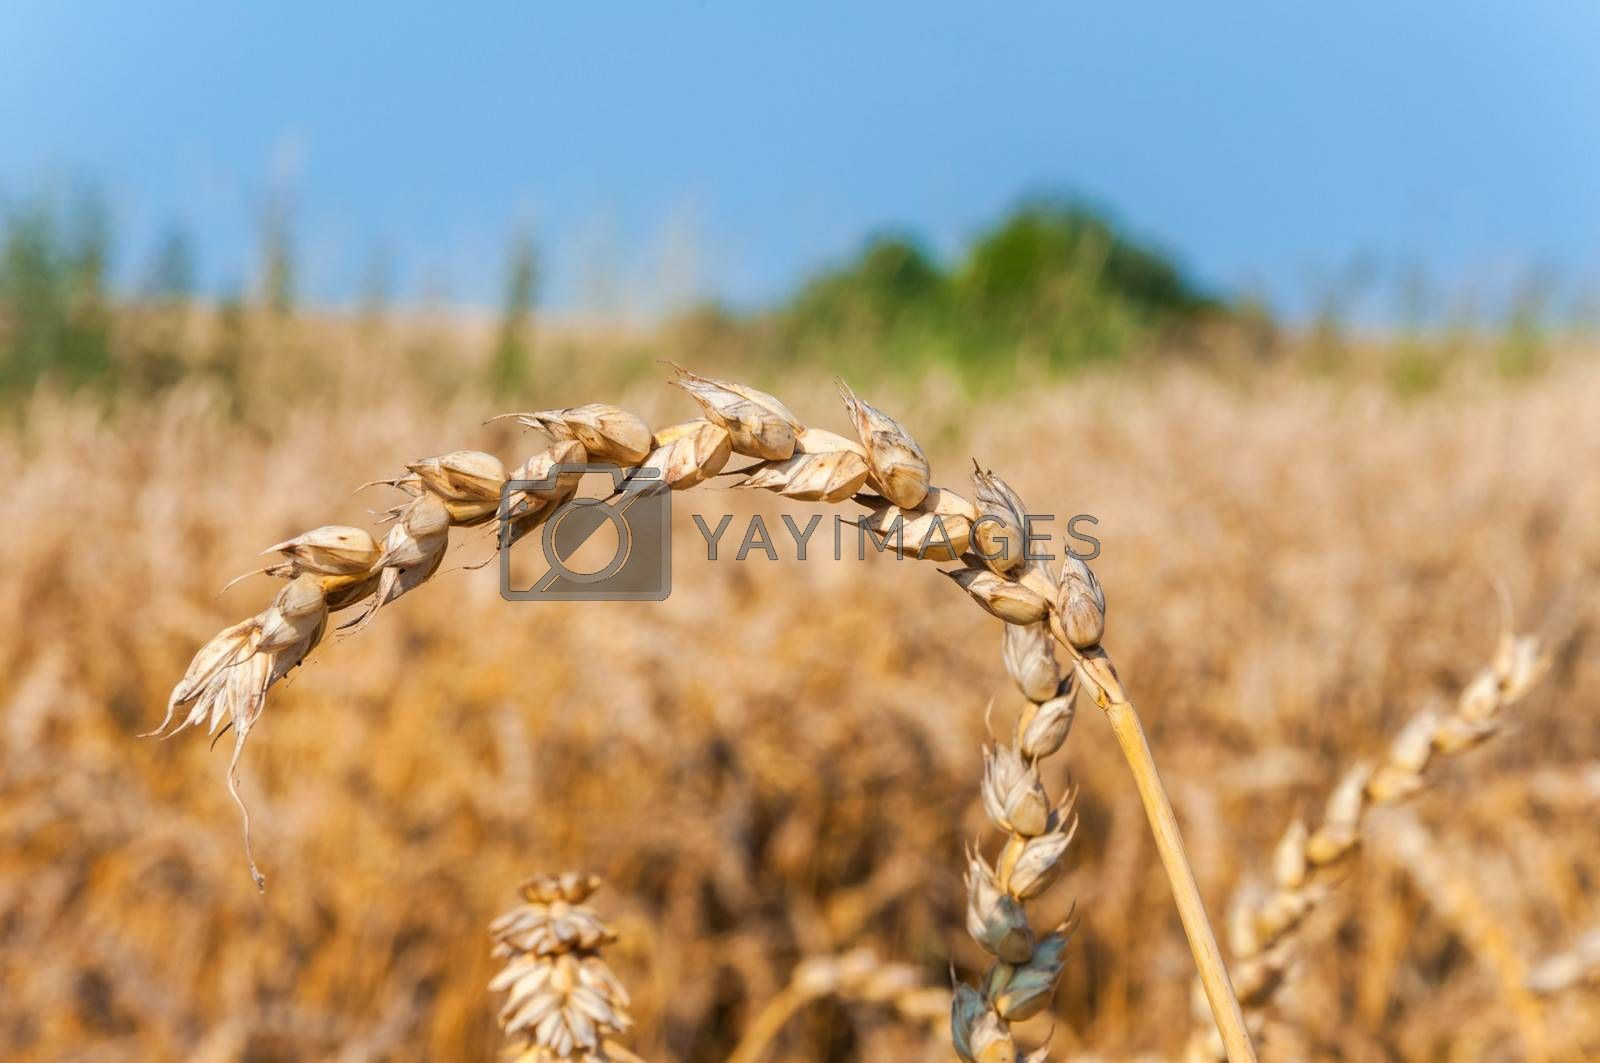 Wheatear on a field in sunny day.